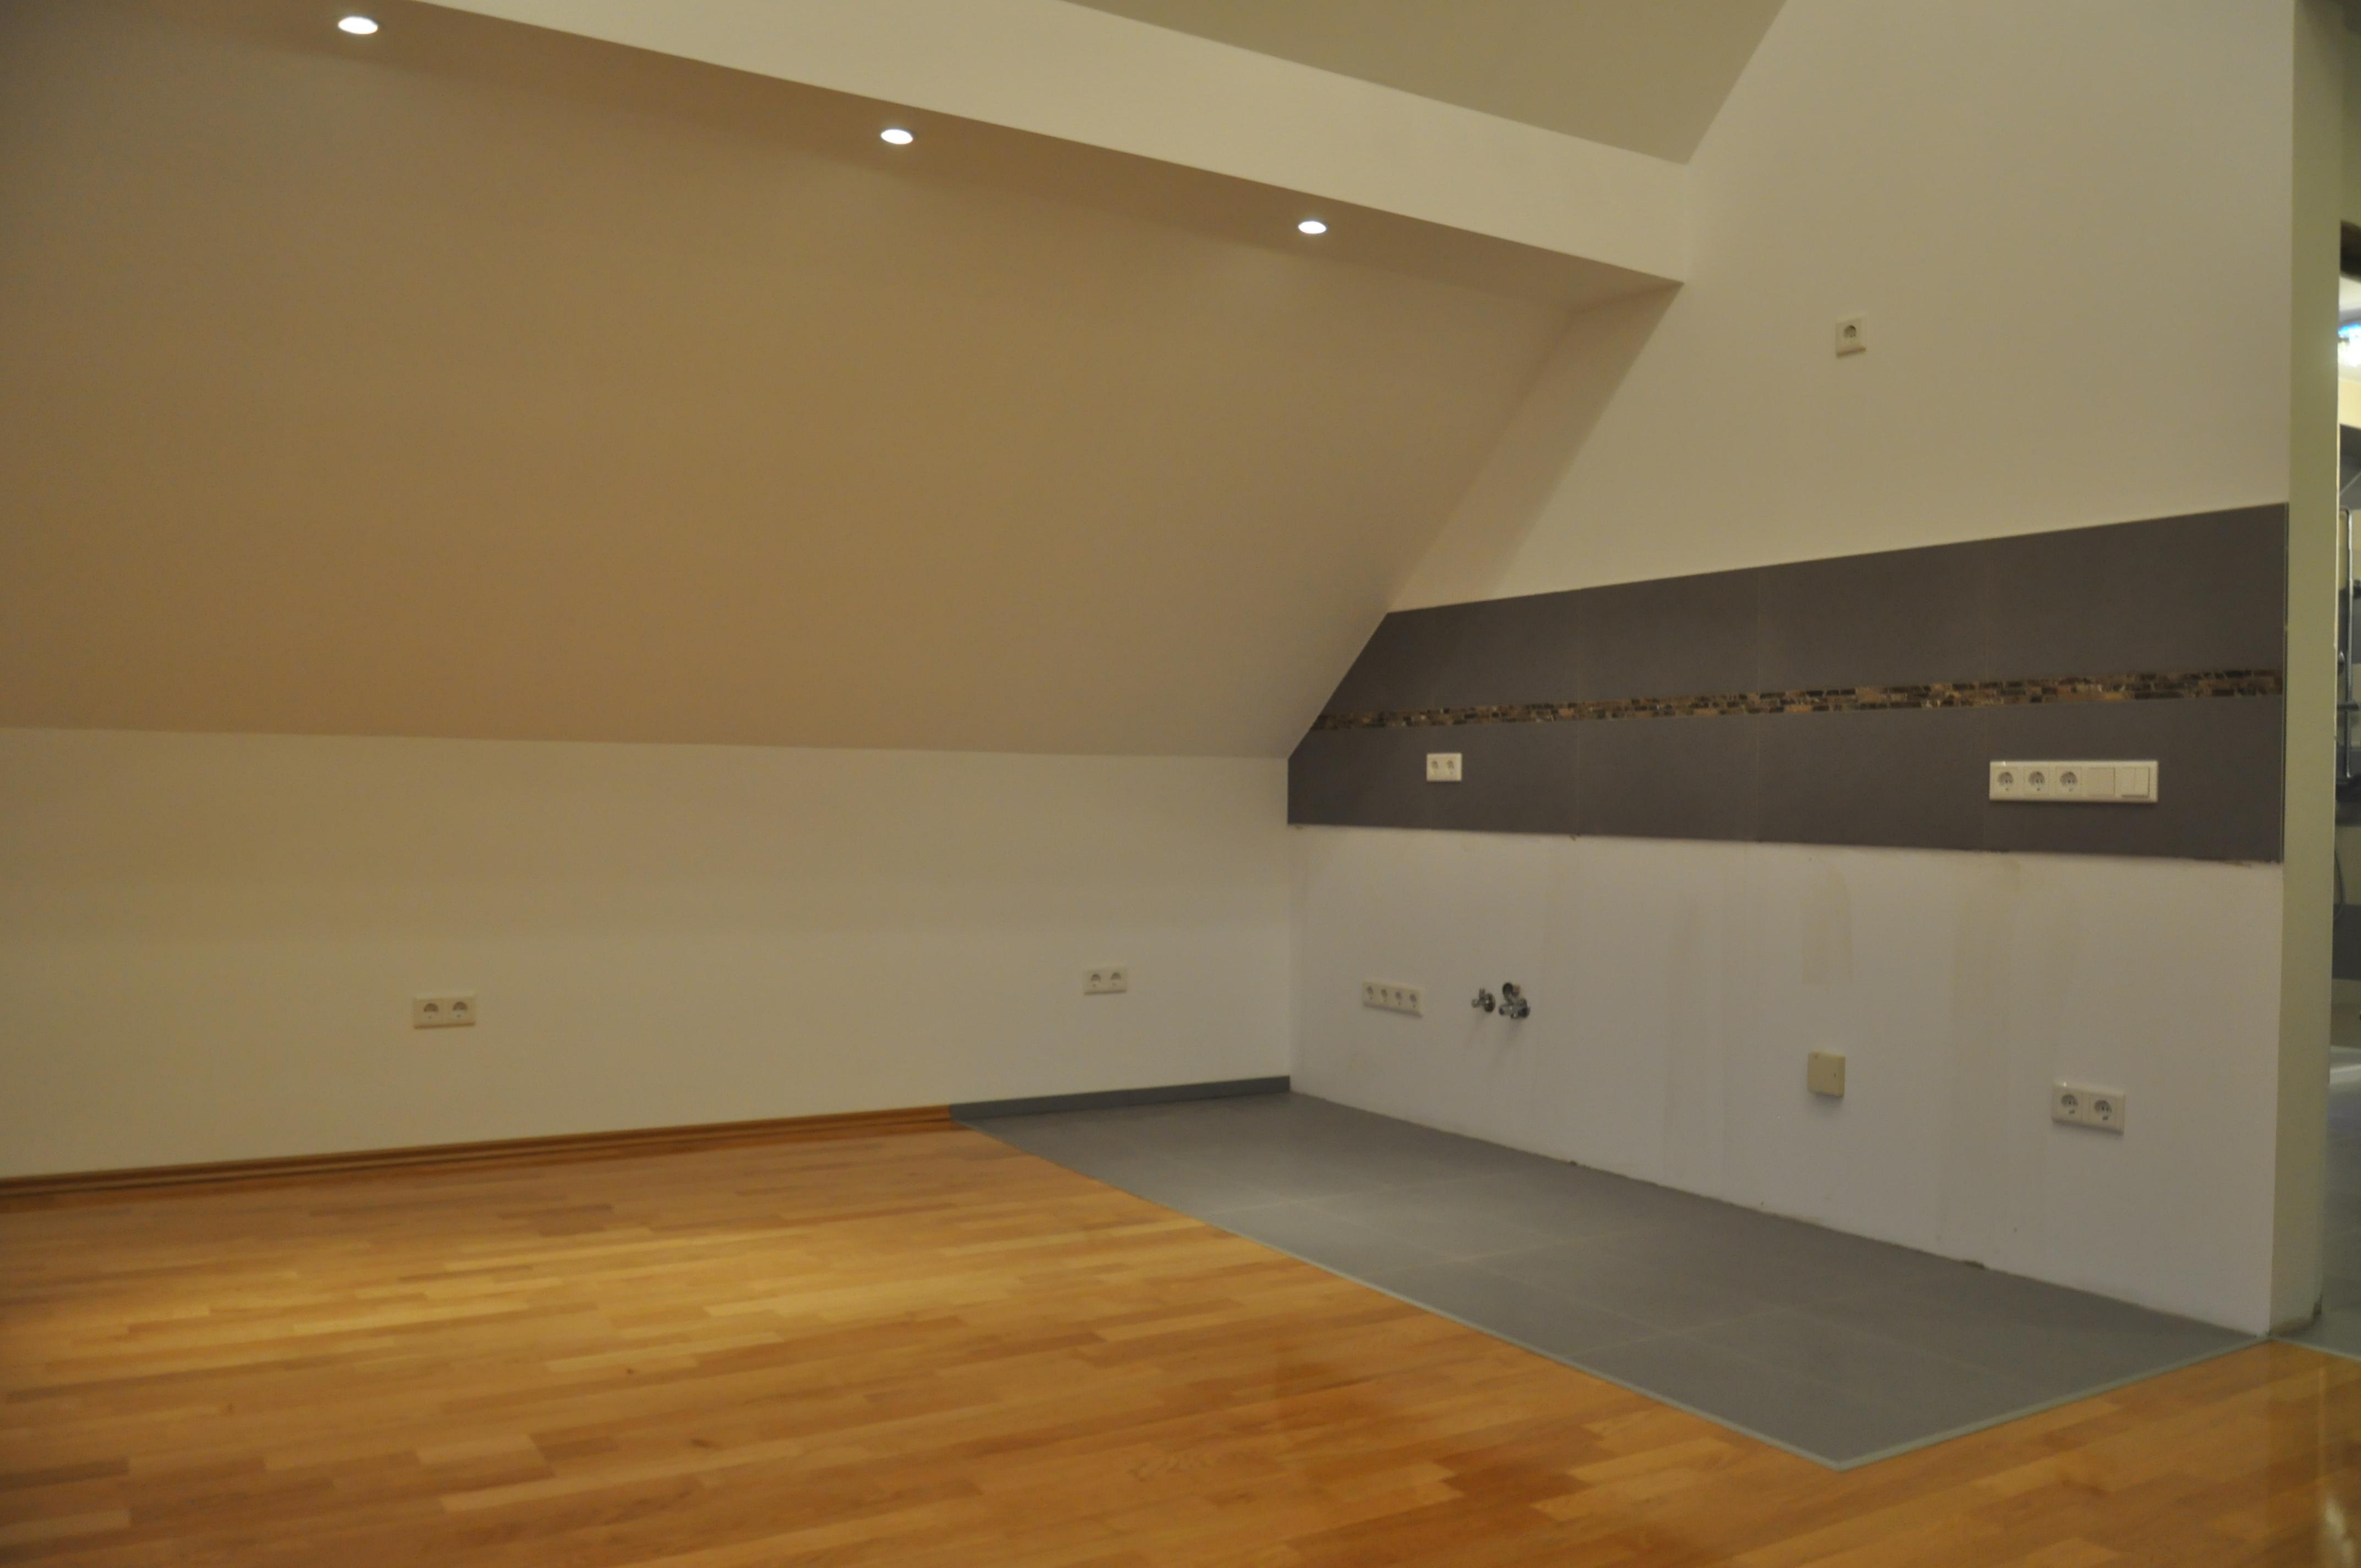 Dachbodenausbau Ideen Schlafzimmer Ideen Fur Romantisches